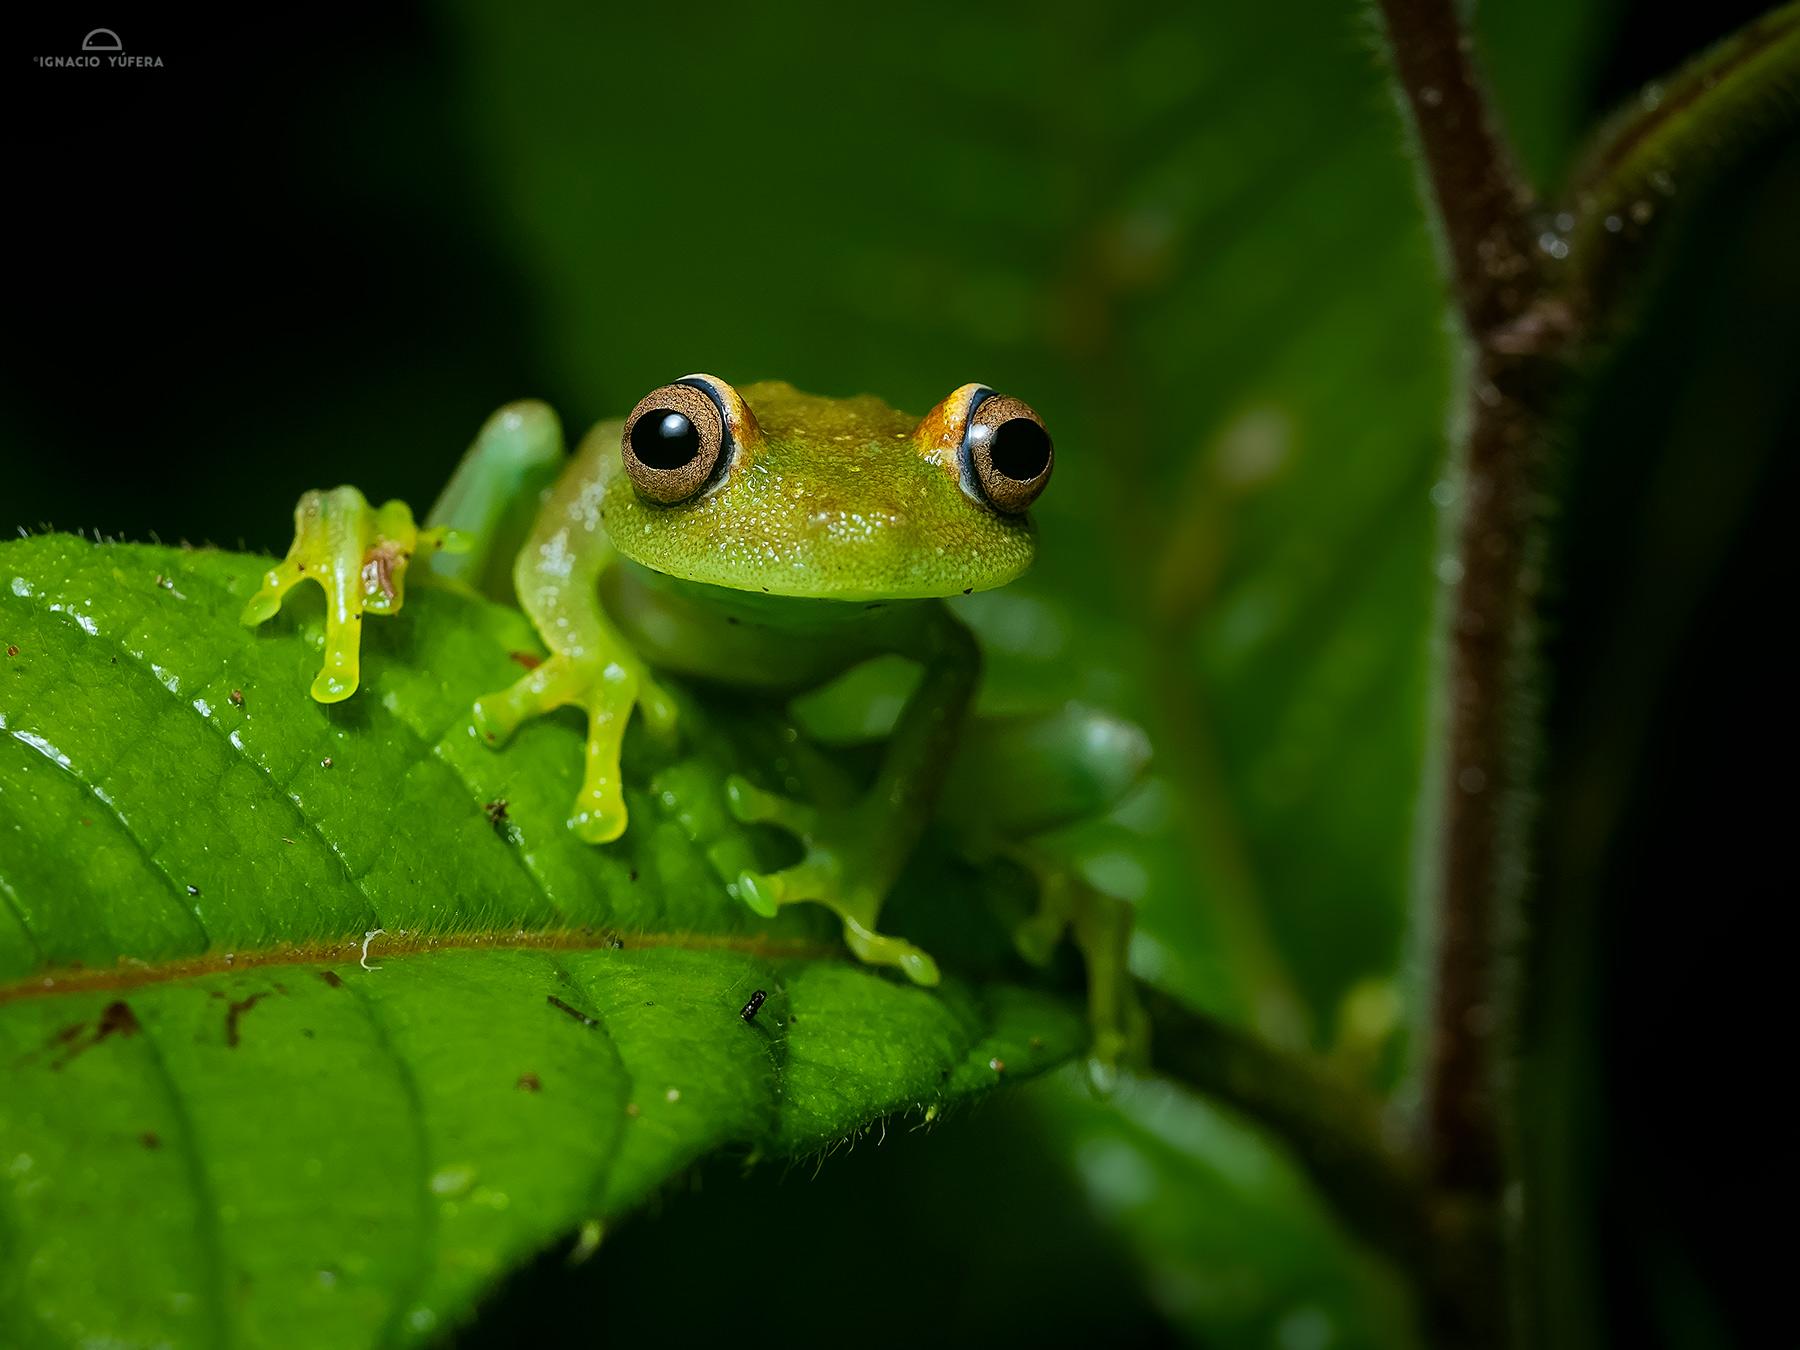 Tree frog (Hypsiboas cinerascens), Madre de Dios, Peru